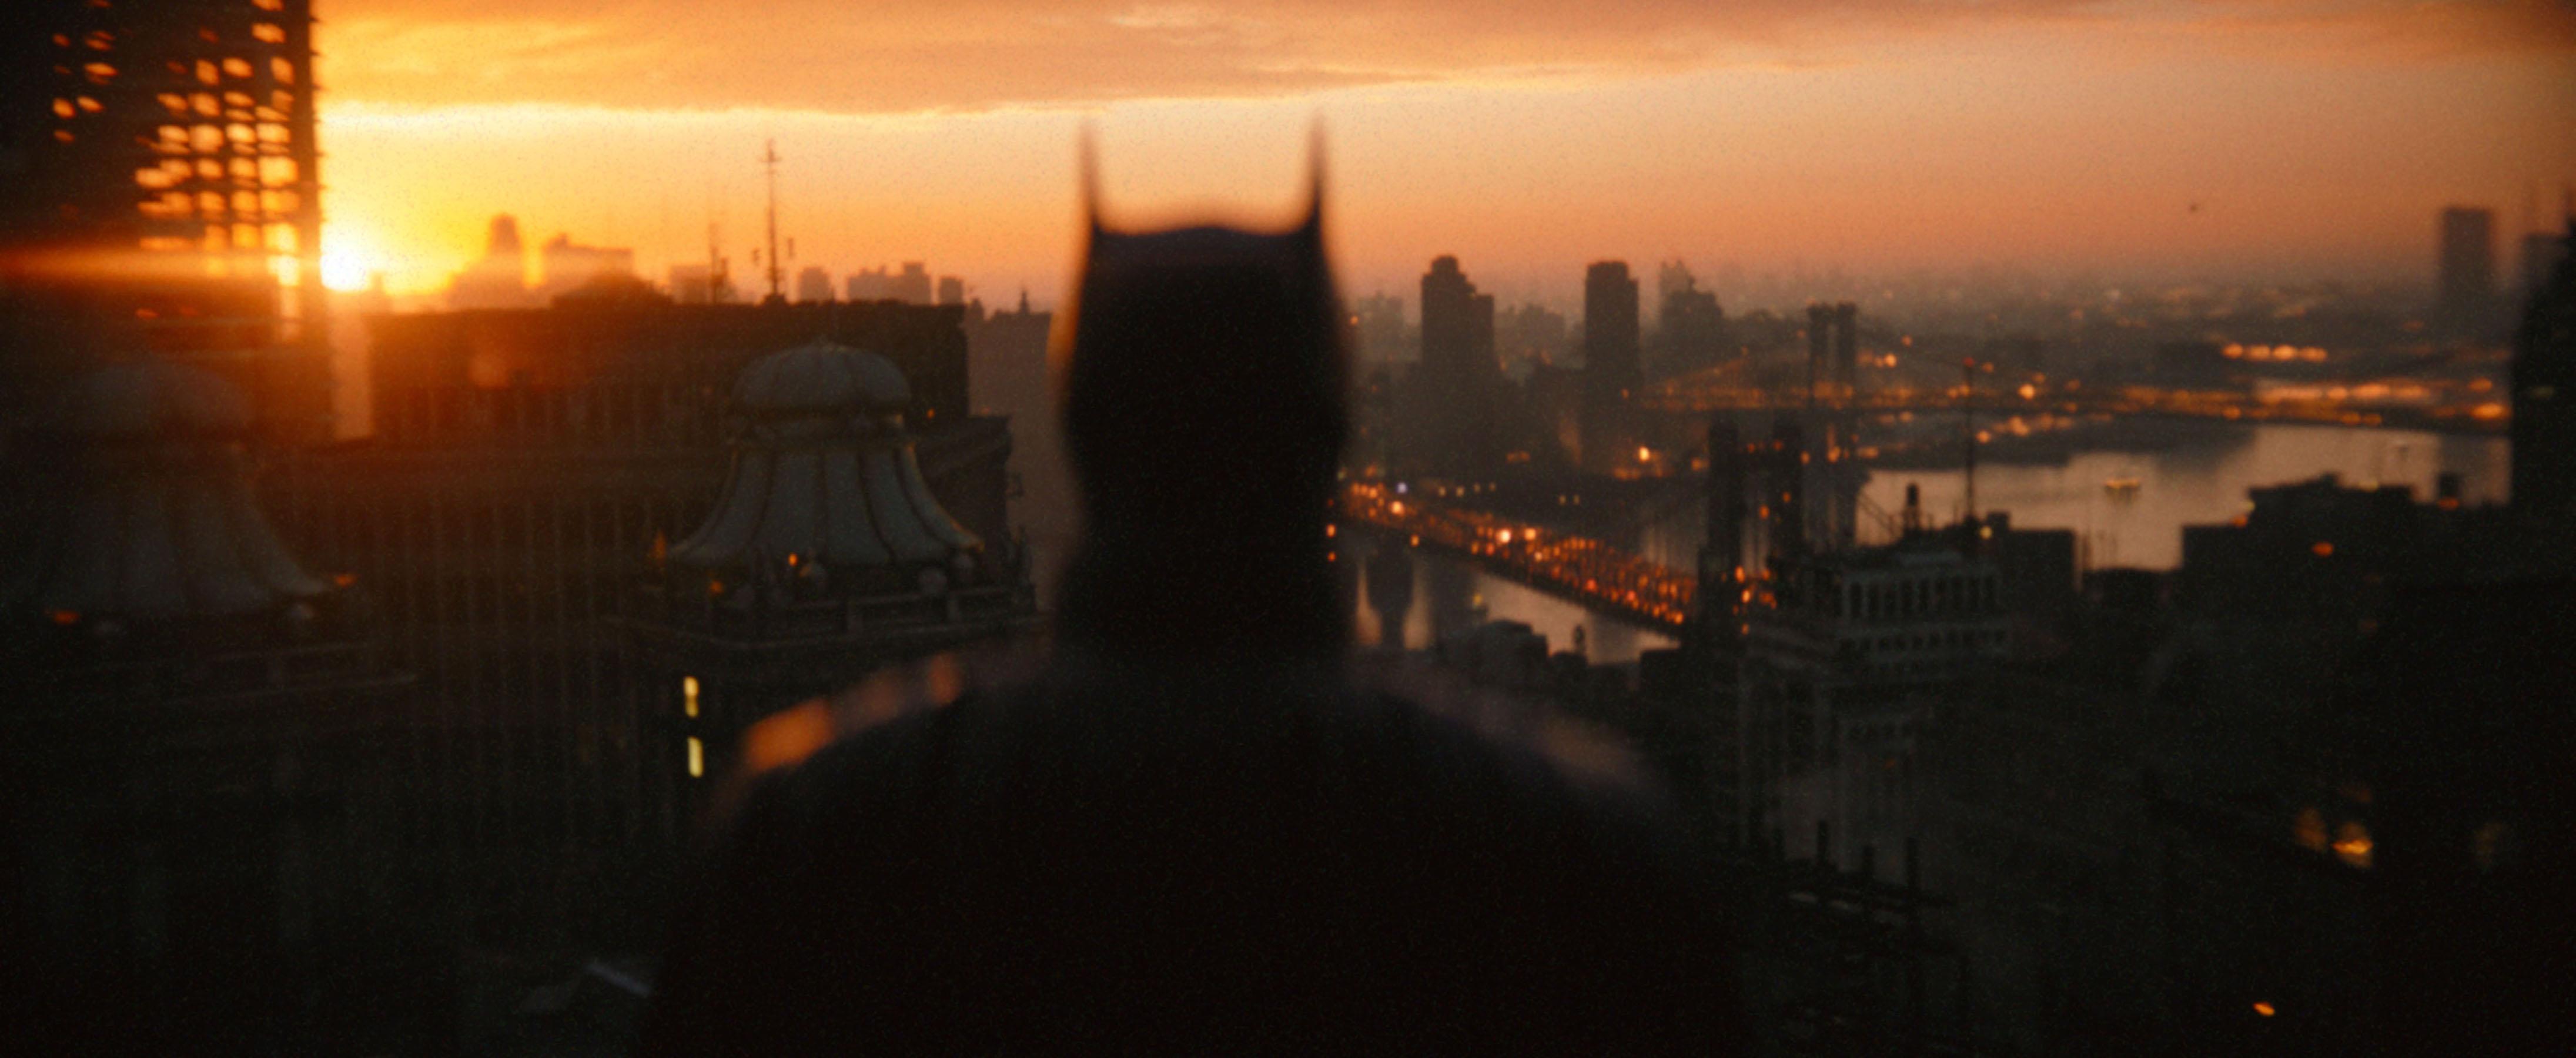 'The Batman' Director Matt Reeves Shares First Look At Zoë Kravitz as Catwoman Selina Kyle